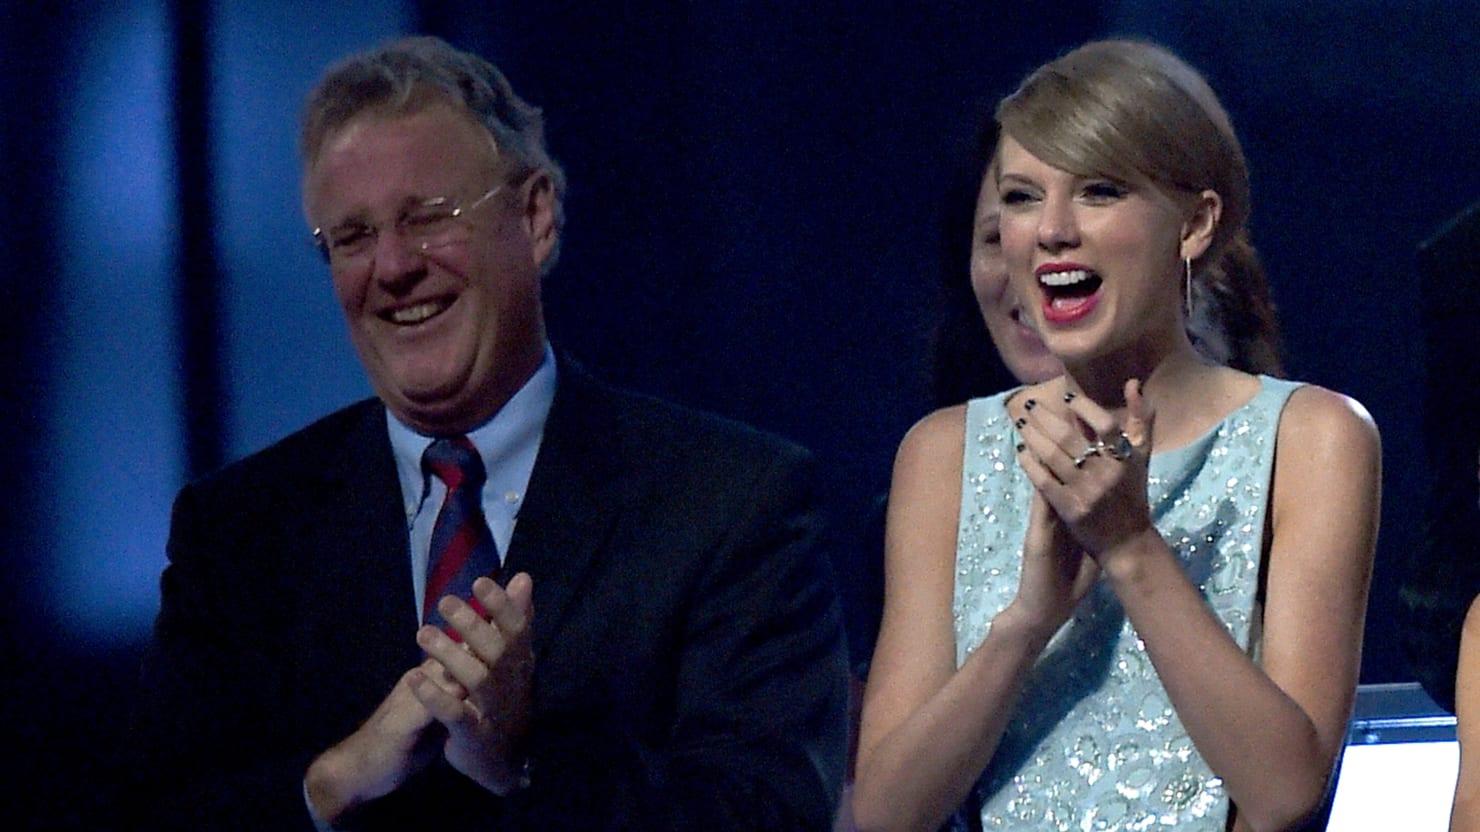 Taylor Swift's Dad Fights Off Burglar in $4 Million Florida Penthouse